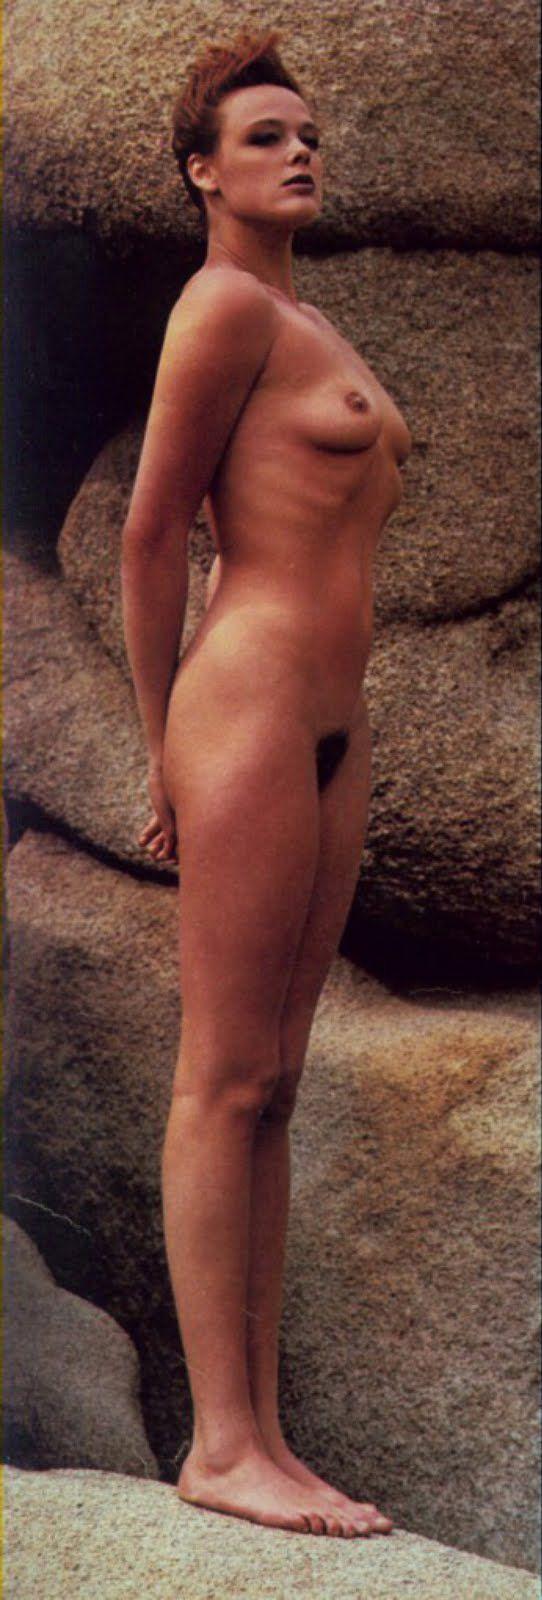 Brigitte nielsen nude pics